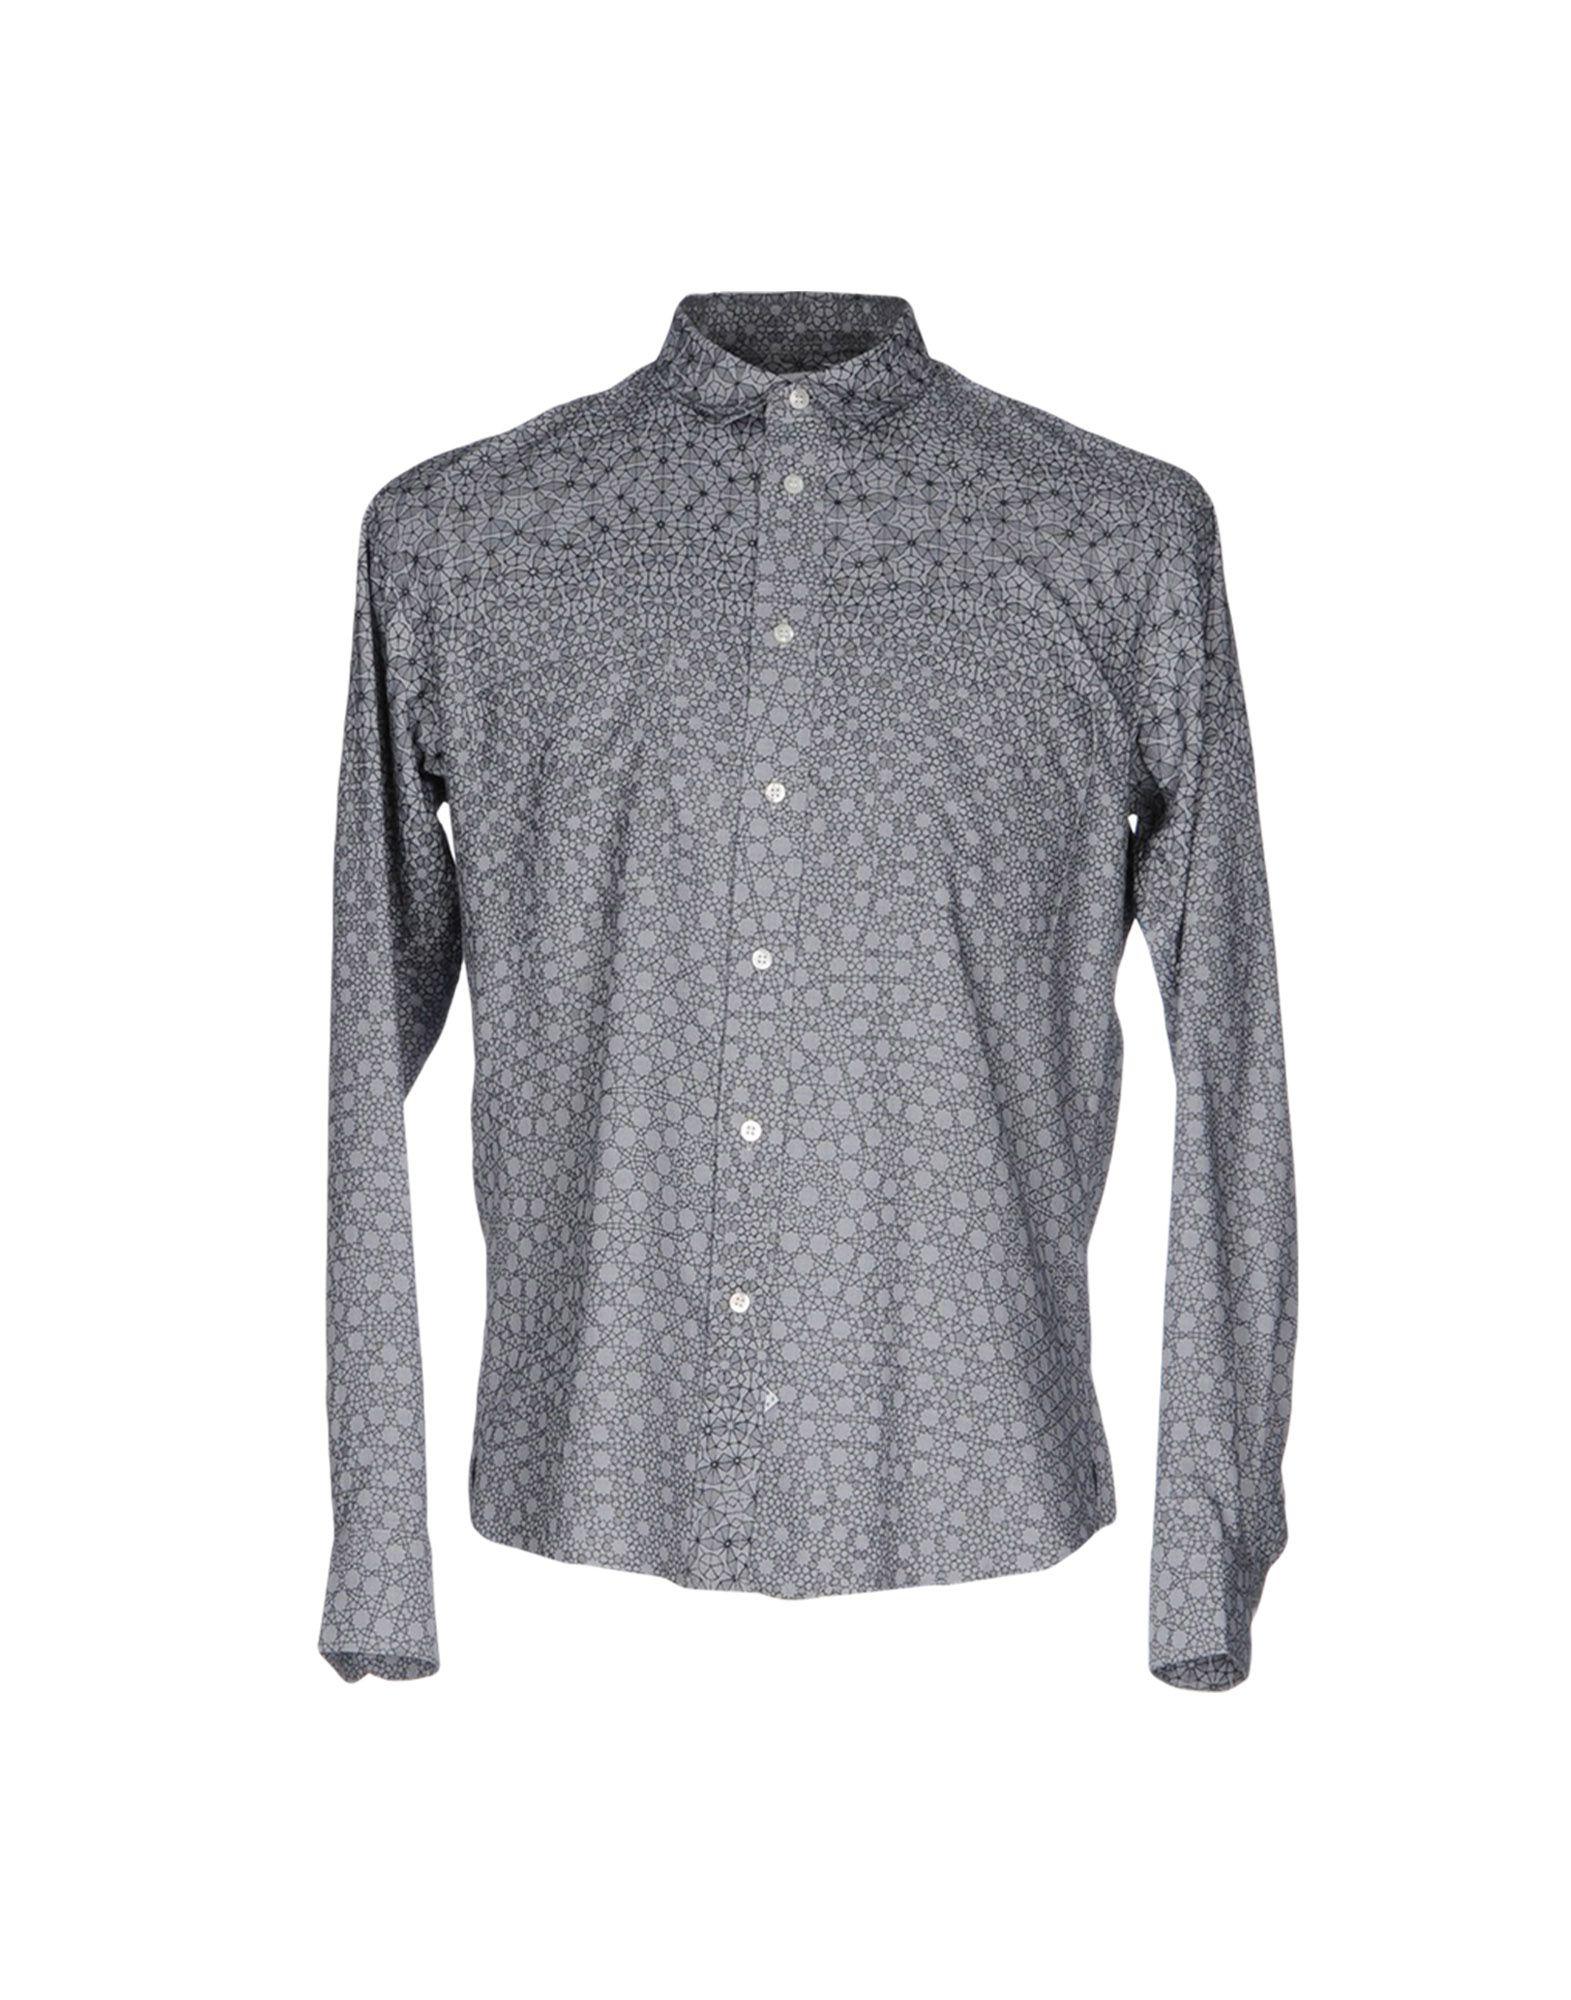 SIDIAN, ERSATZ & VANES Patterned Shirt in Light Grey